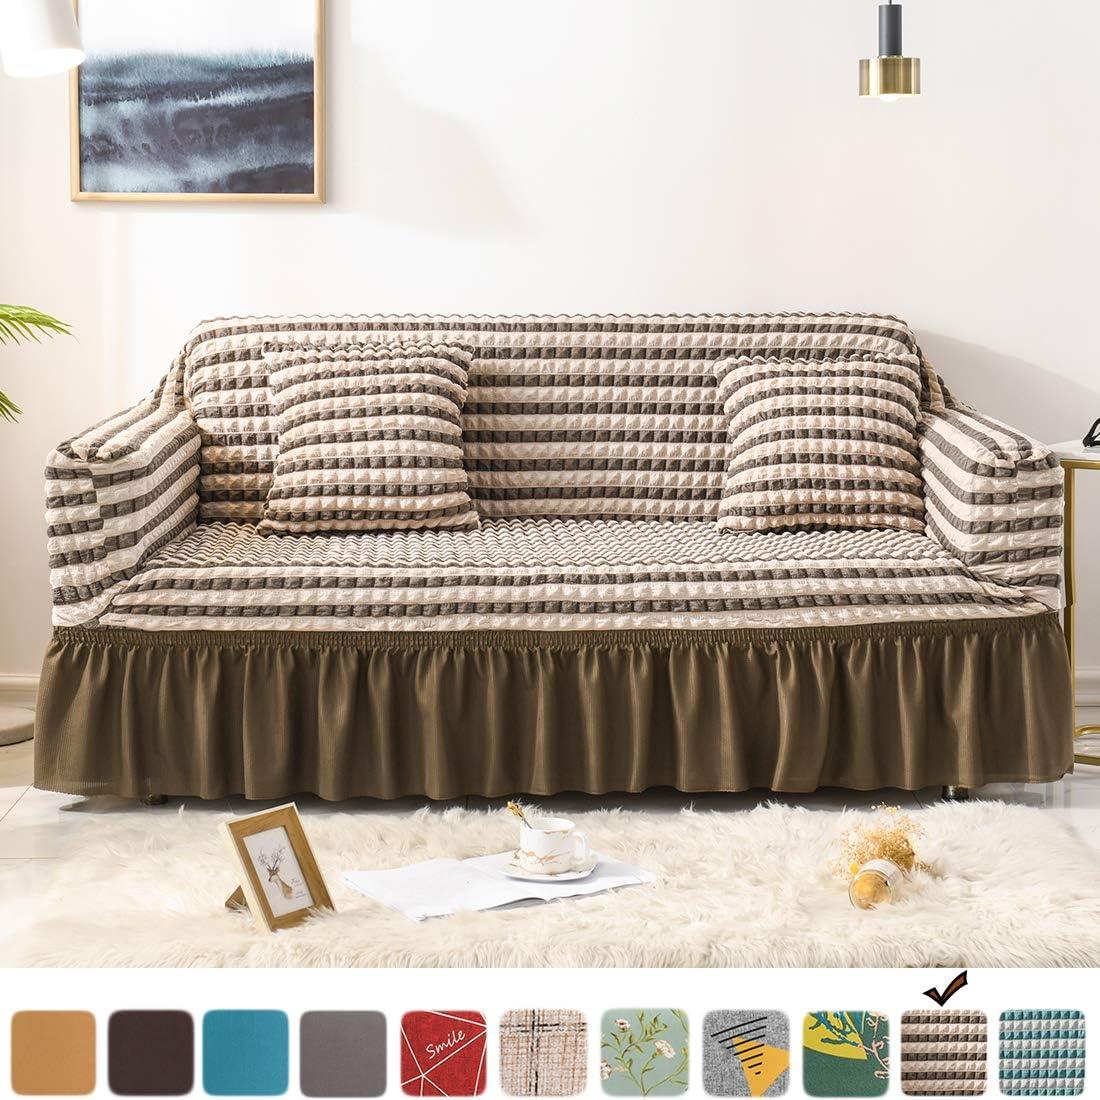 Free Amazon Promo Code 2020 for Fluffy Cat Seersucker Sofa Cover